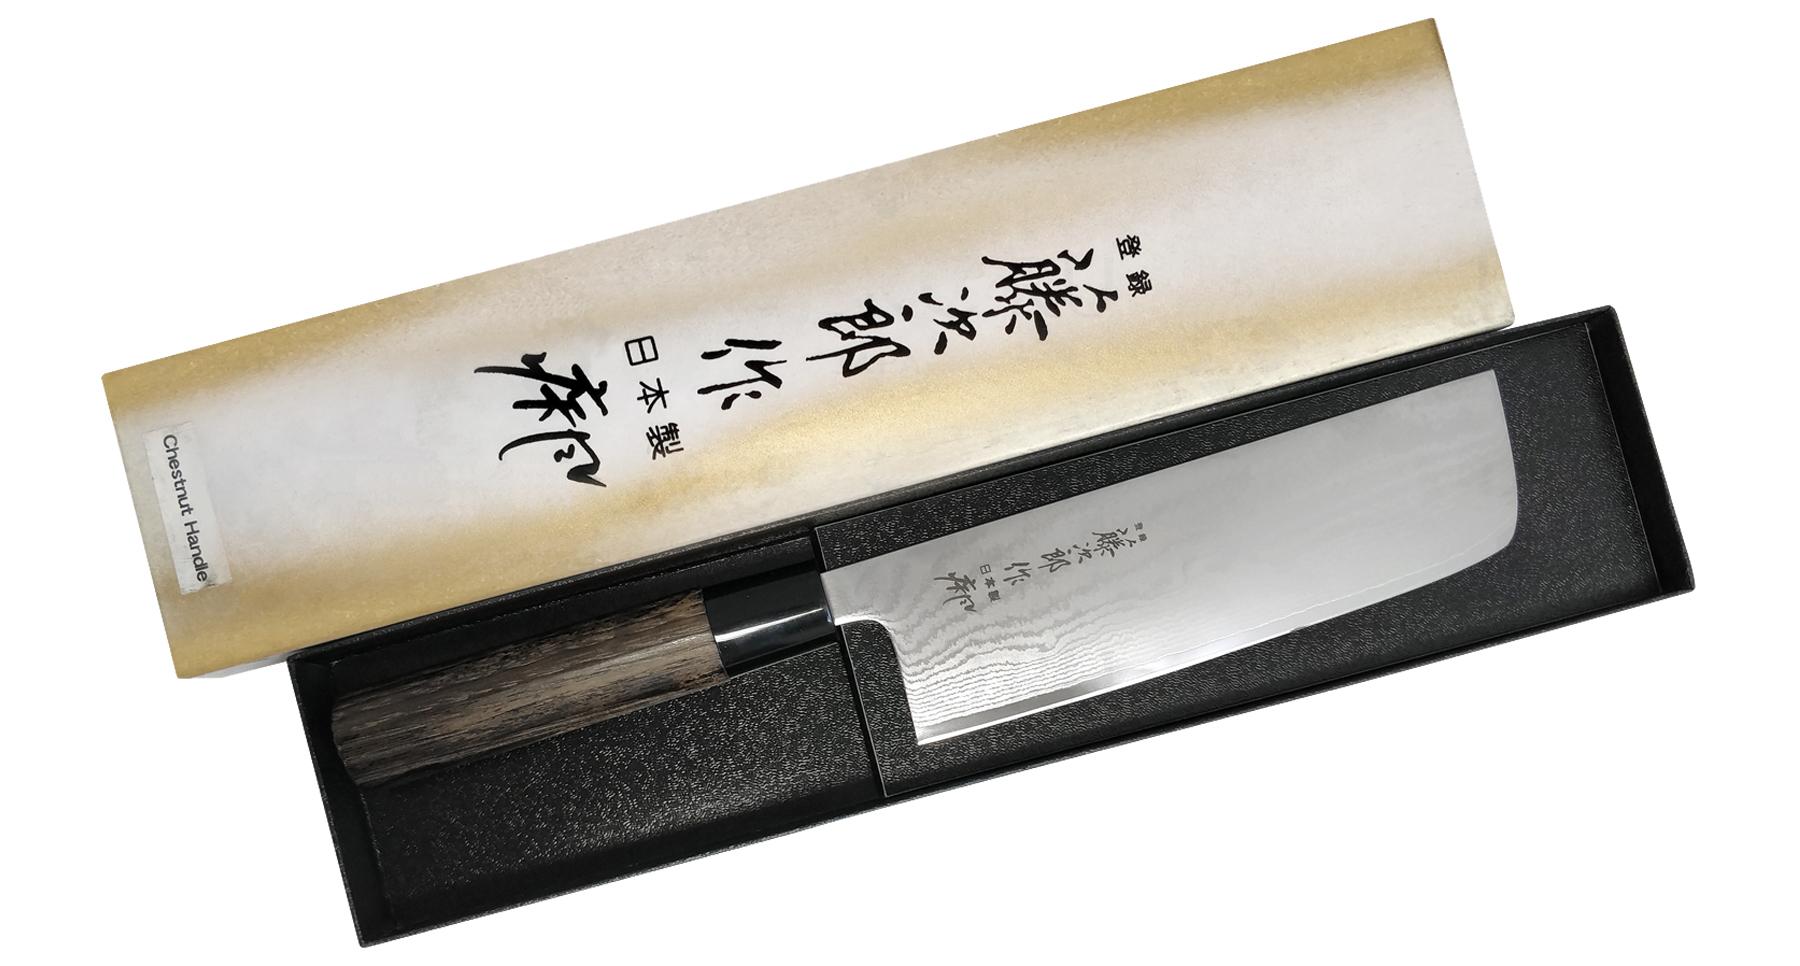 Фото 4 - Кухонный нож для овощей Накири, Zen, TOJIRO, FD-568, сталь VG-10, в картонной коробке